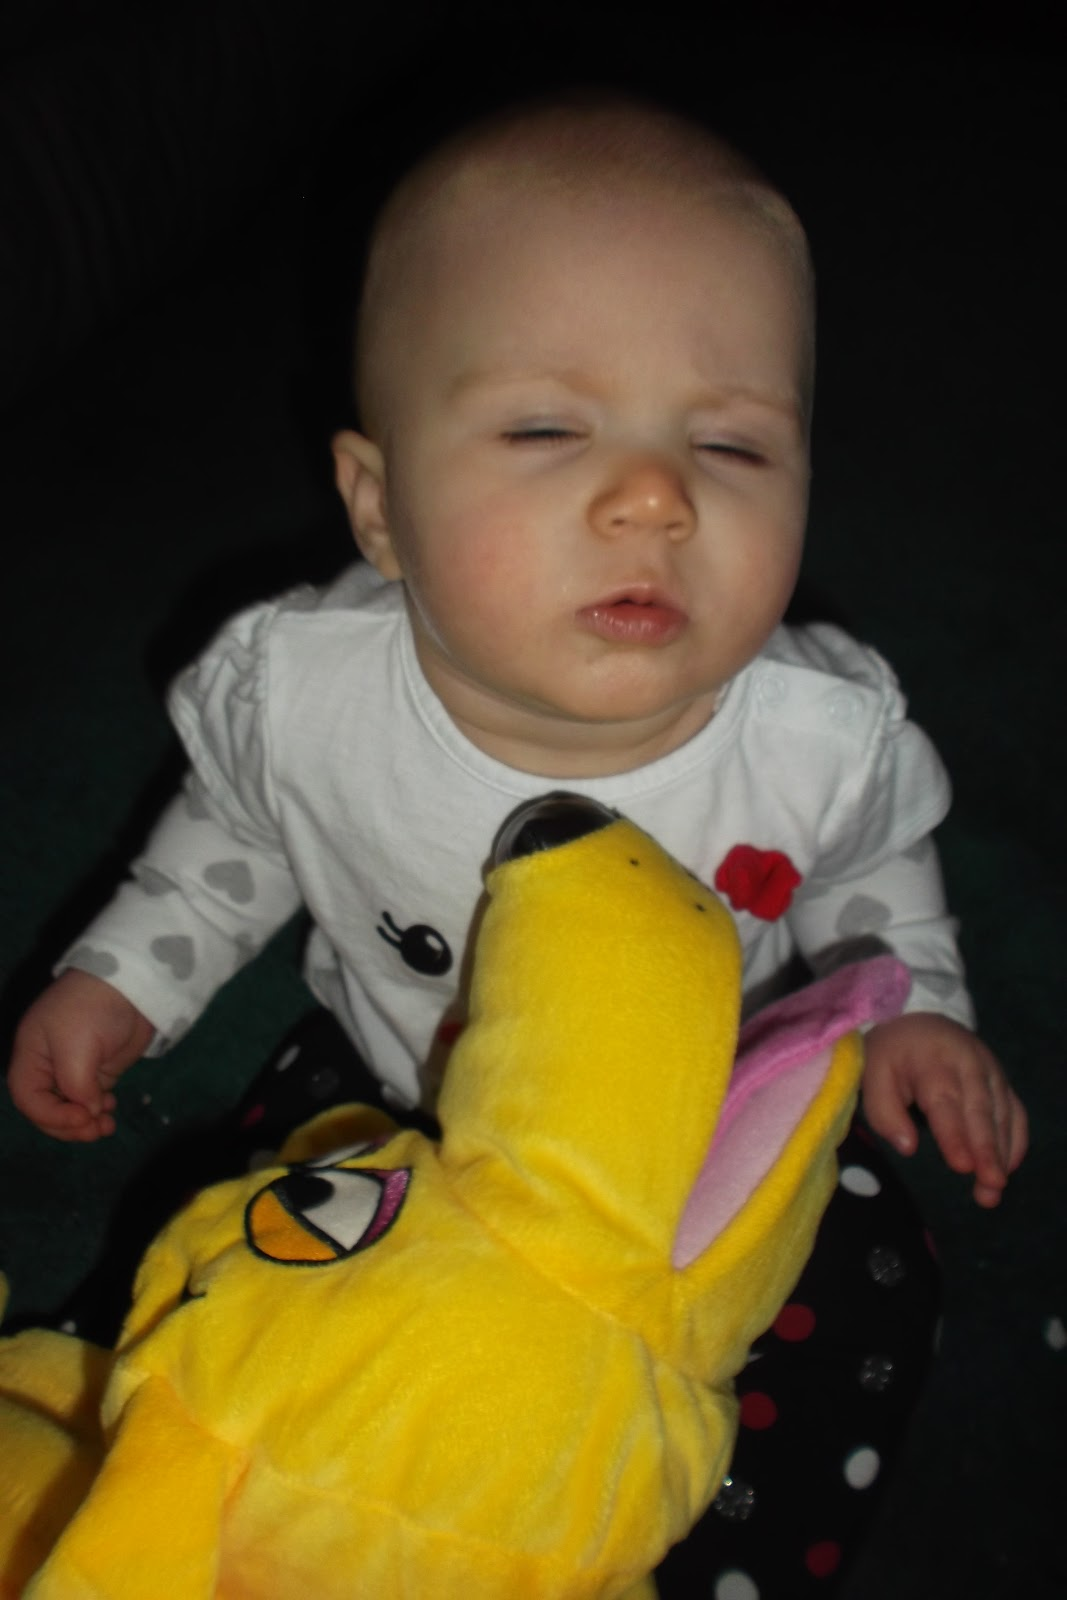 http://4.bp.blogspot.com/-E5OYbzJssUs/UKUvla2CcmI/AAAAAAAAFOw/CPFHW_ggw3Y/s1600/CuddleUppets%2BDog.jpg